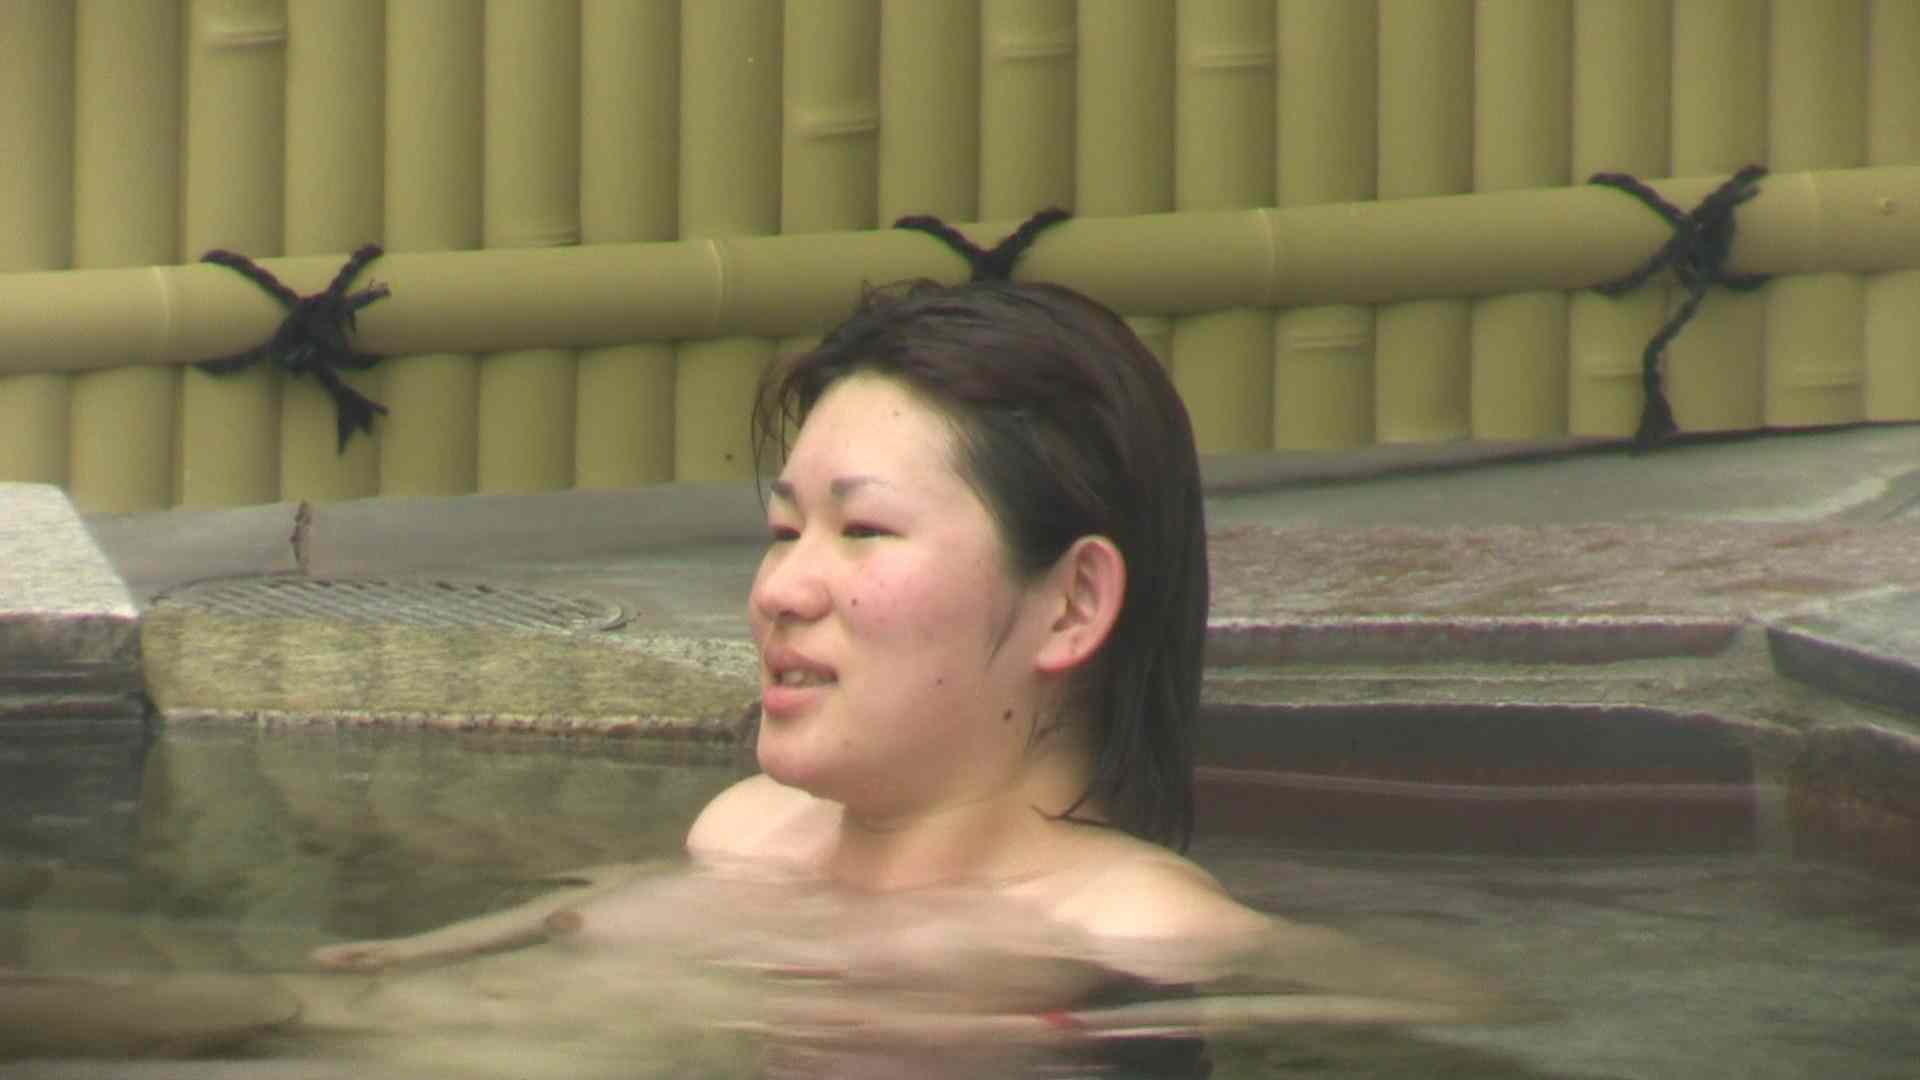 Aquaな露天風呂Vol.673 露天風呂突入 盗み撮り動画キャプチャ 99pic 50